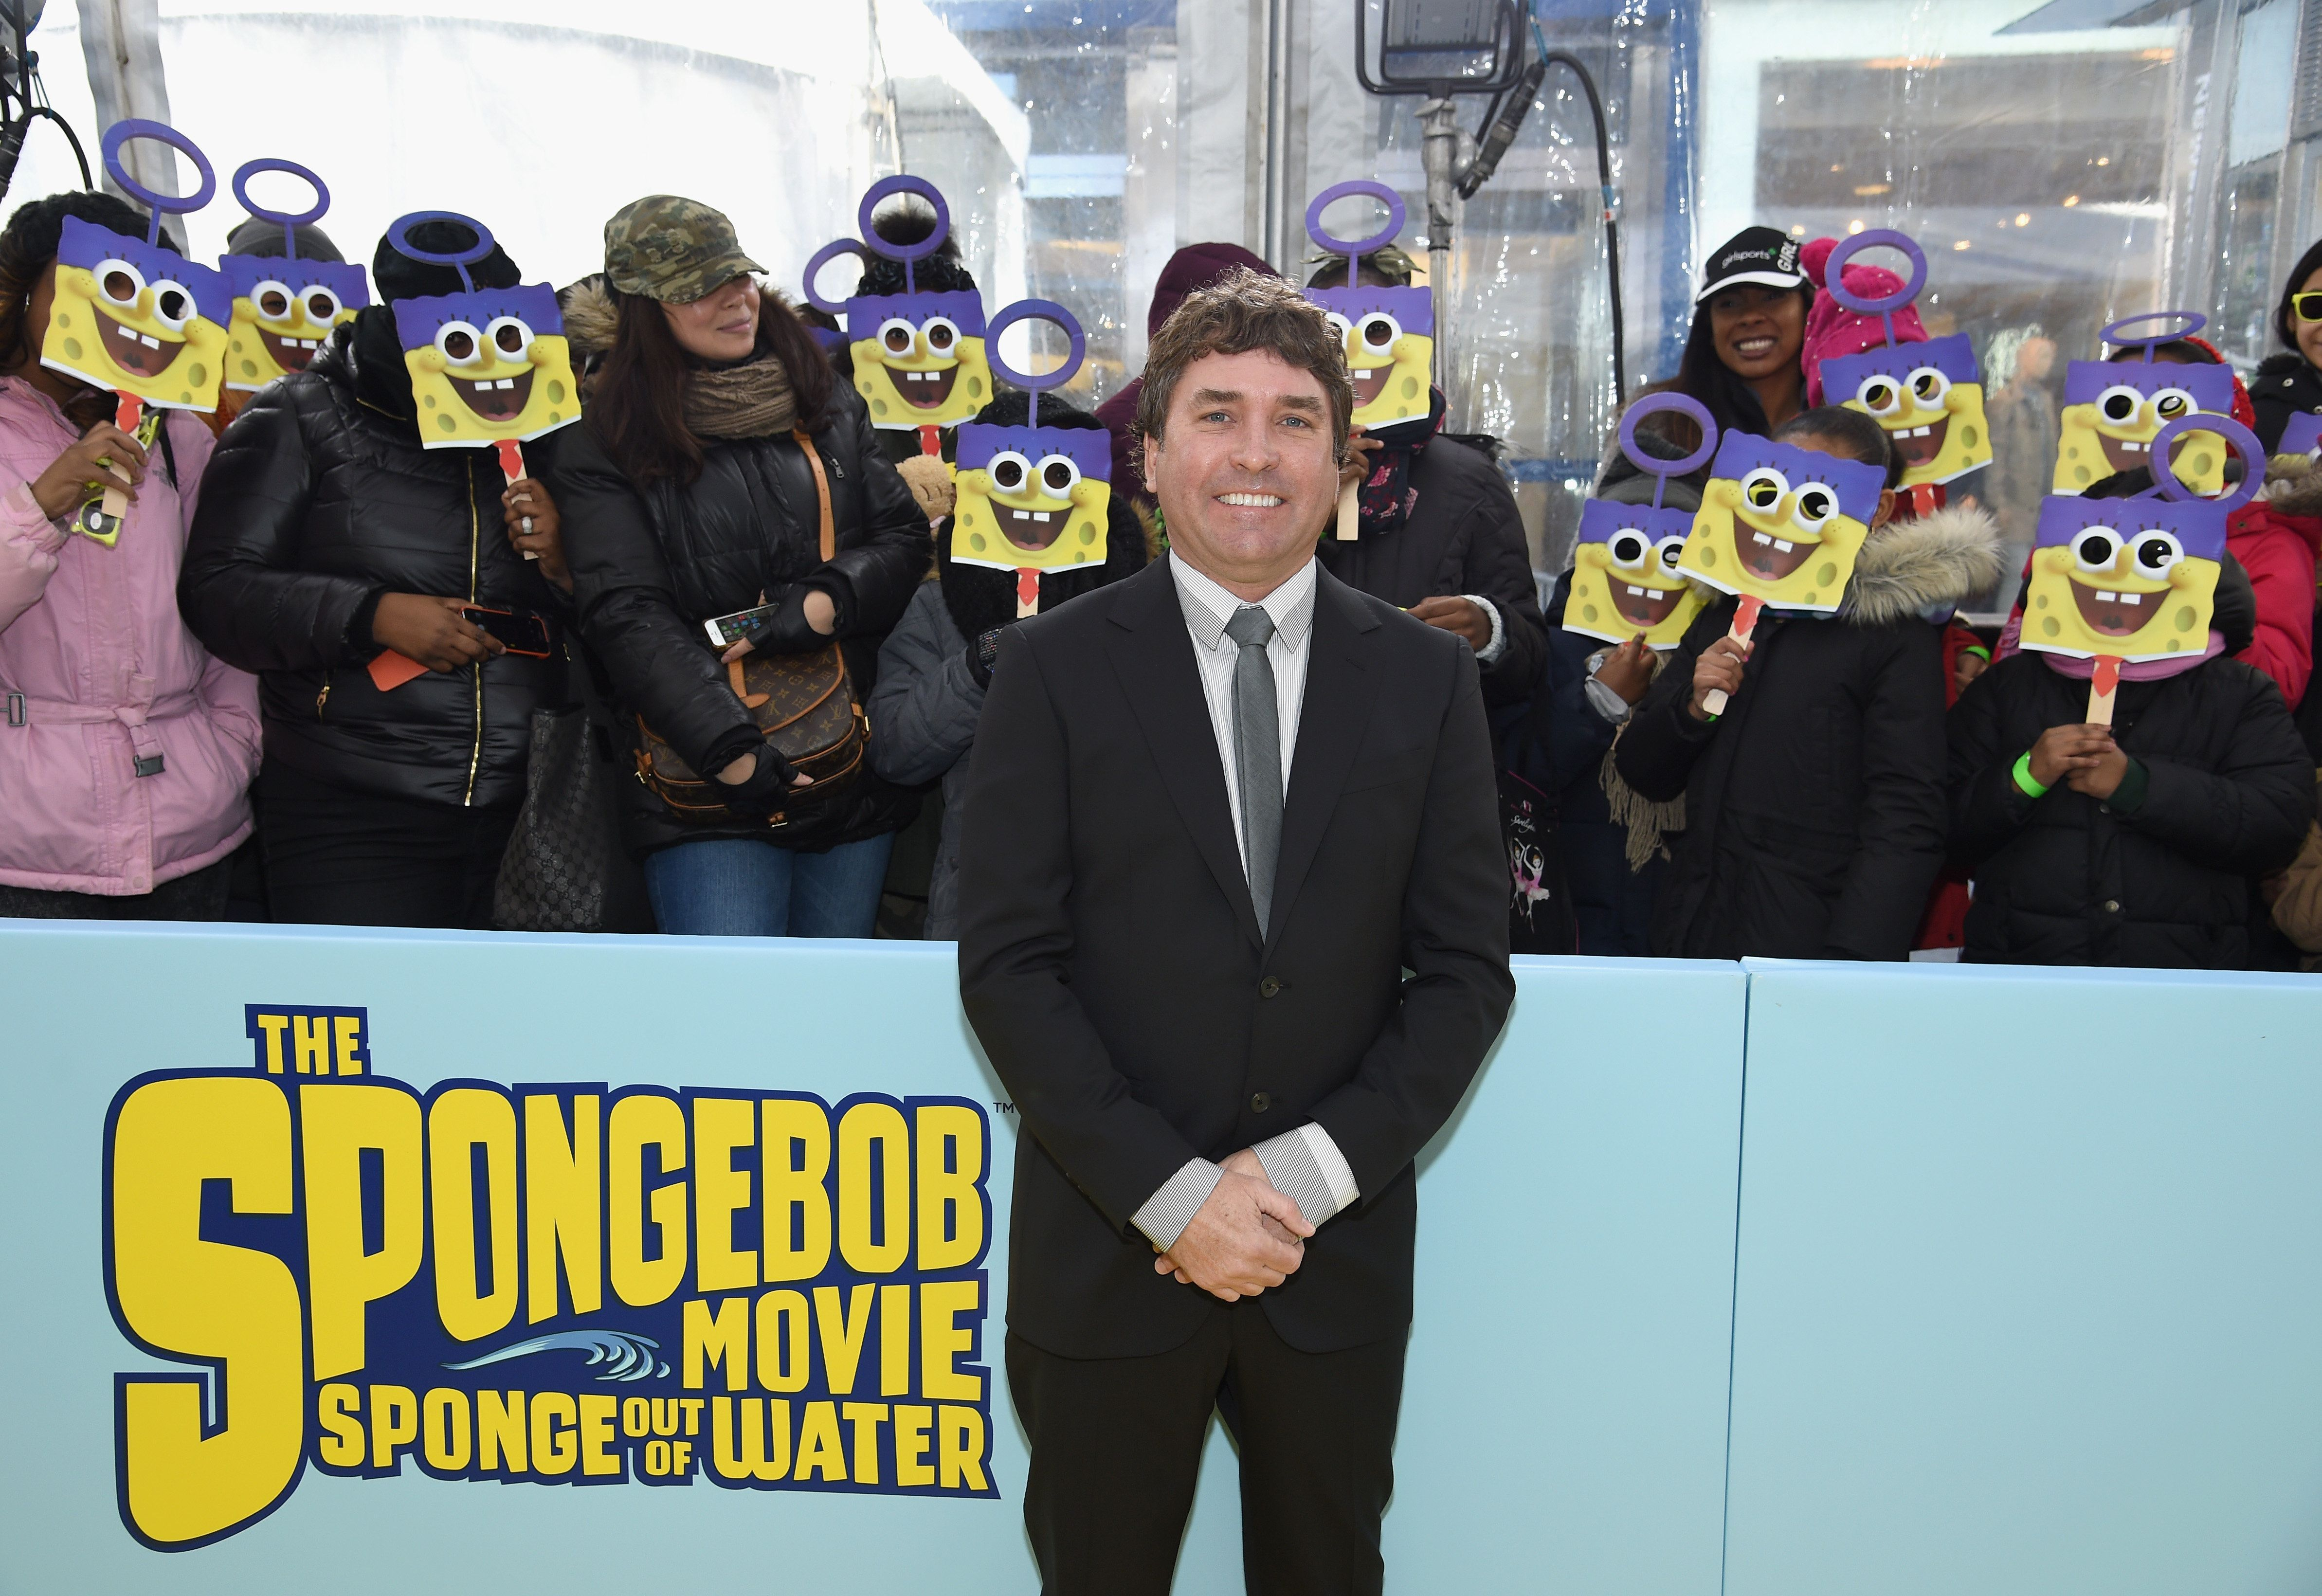 'SpongeBob SquarePants' Creator Stephen Hillenburg Dies, Aged